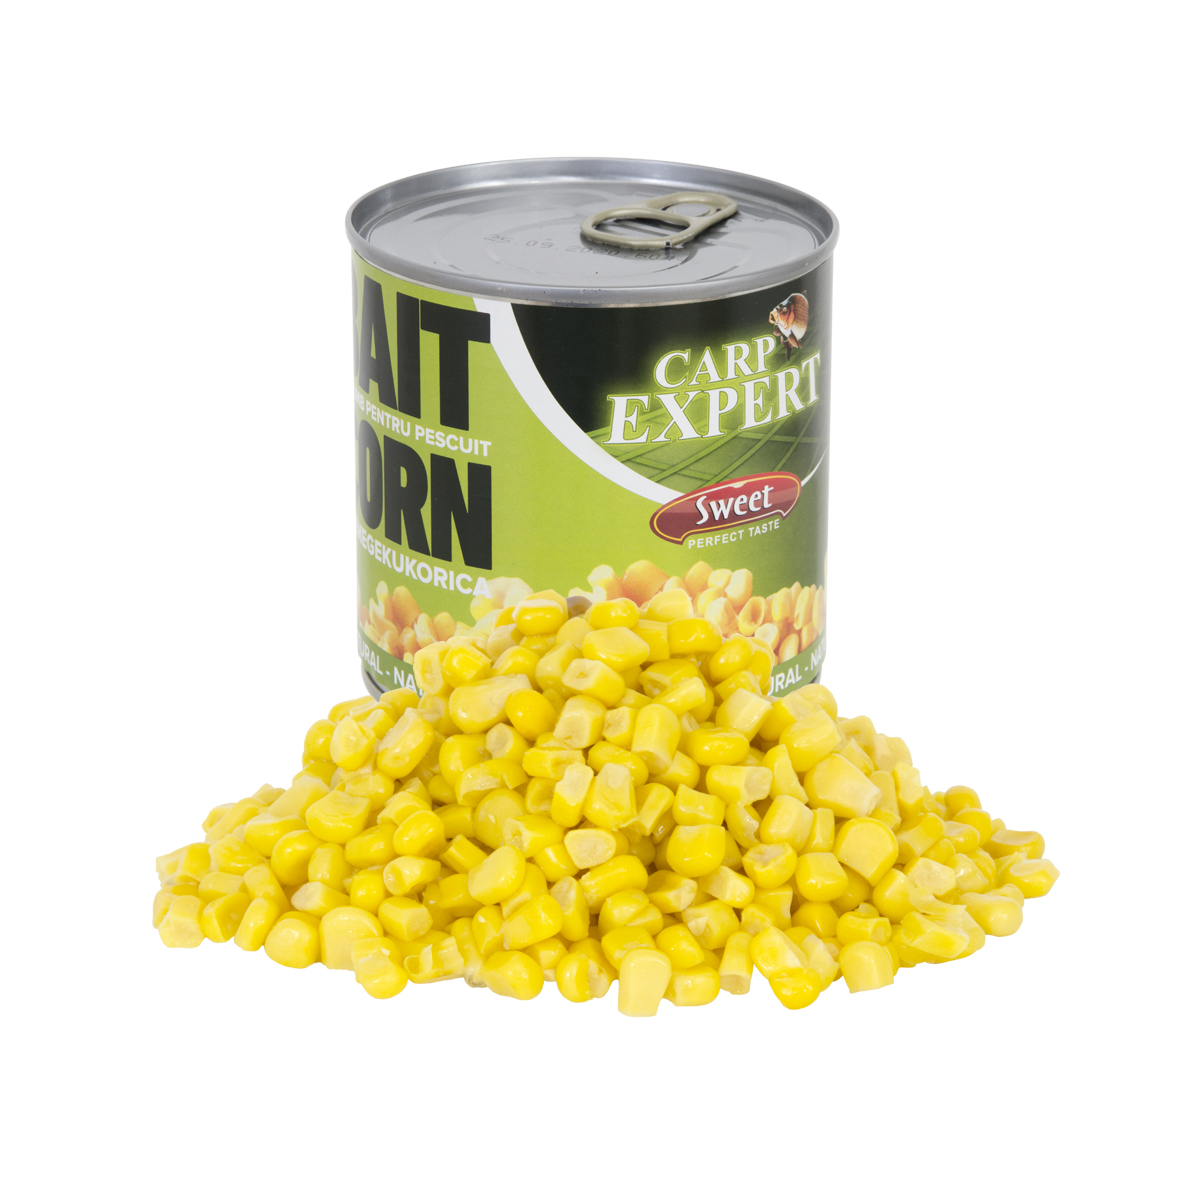 Carp expert kukurica - 340 g, Natúr